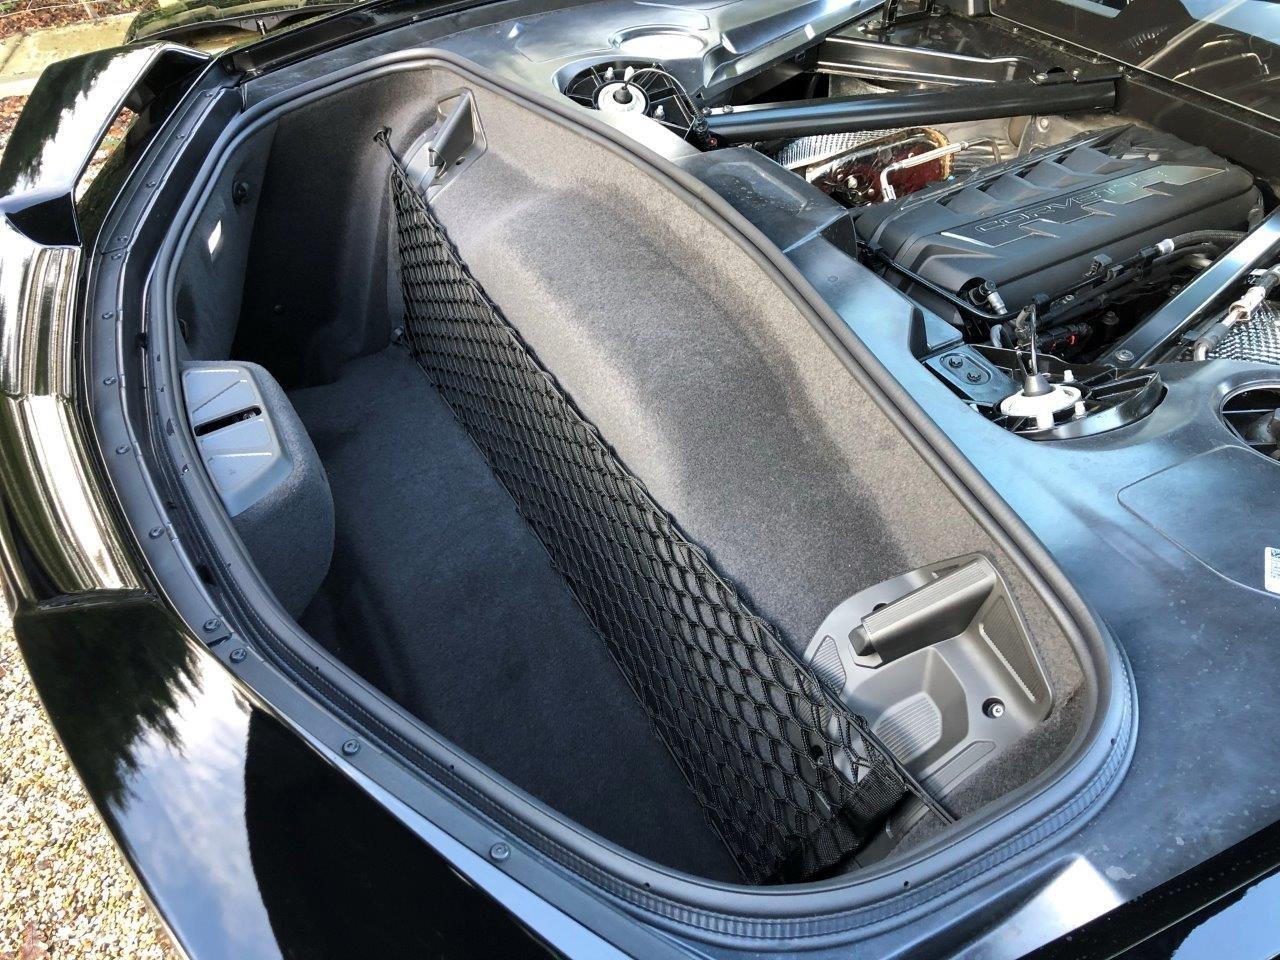 2020 Chevrolet Corvette C8 Z51 Stingray 3LT Coupe For Sale (picture 11 of 12)